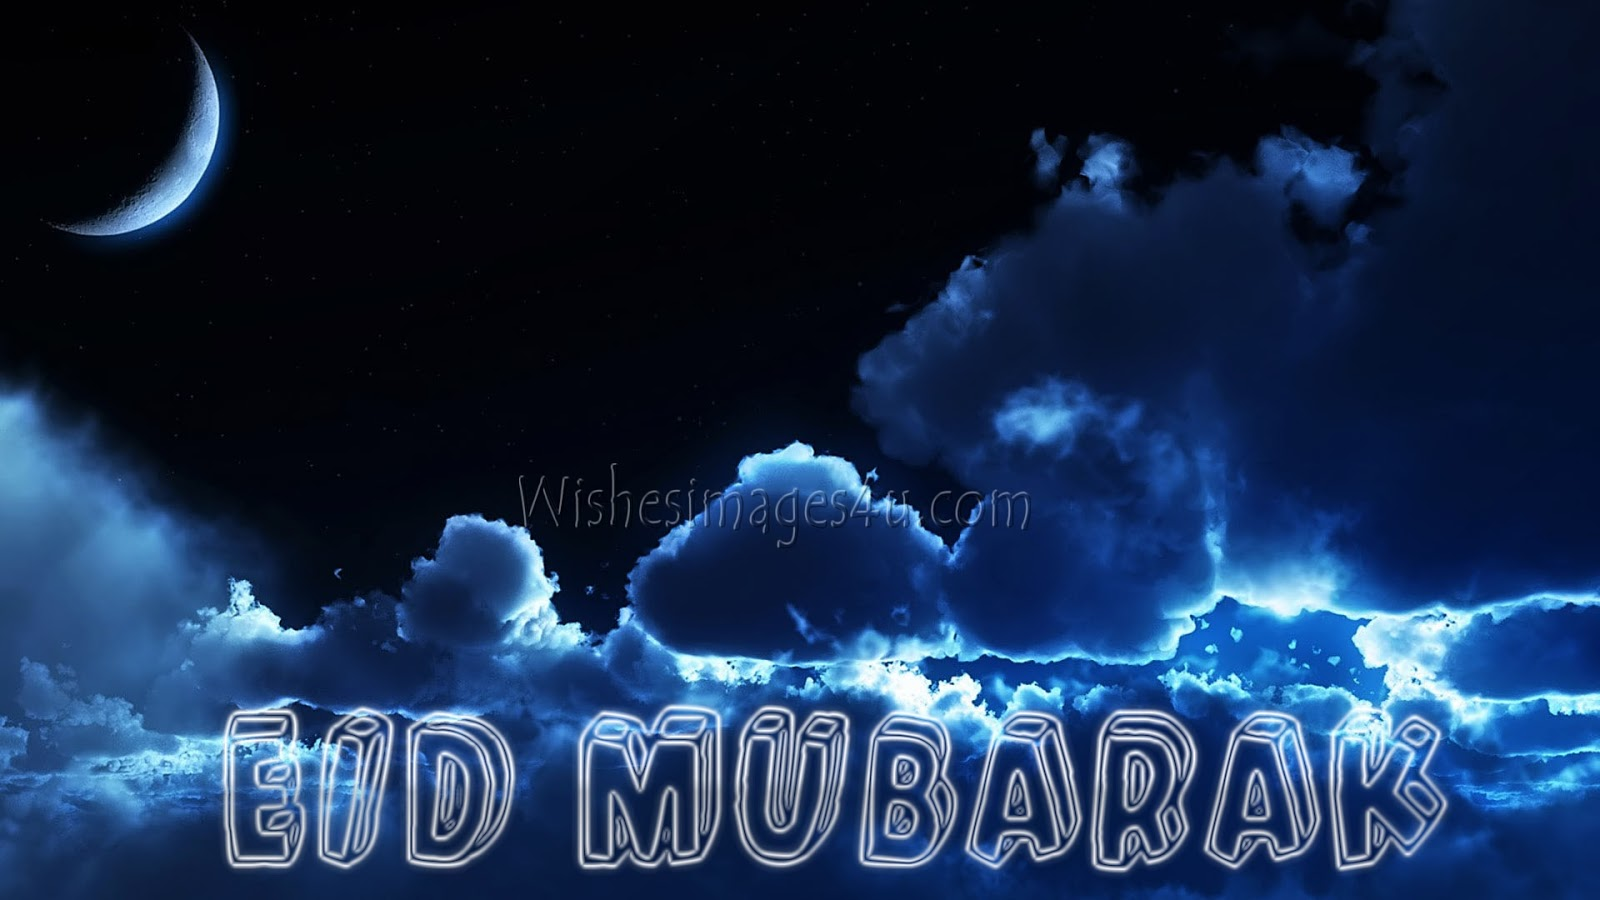 eid mubarak 3d wallpapers 2018 latest - eid mubarak 3d desktop